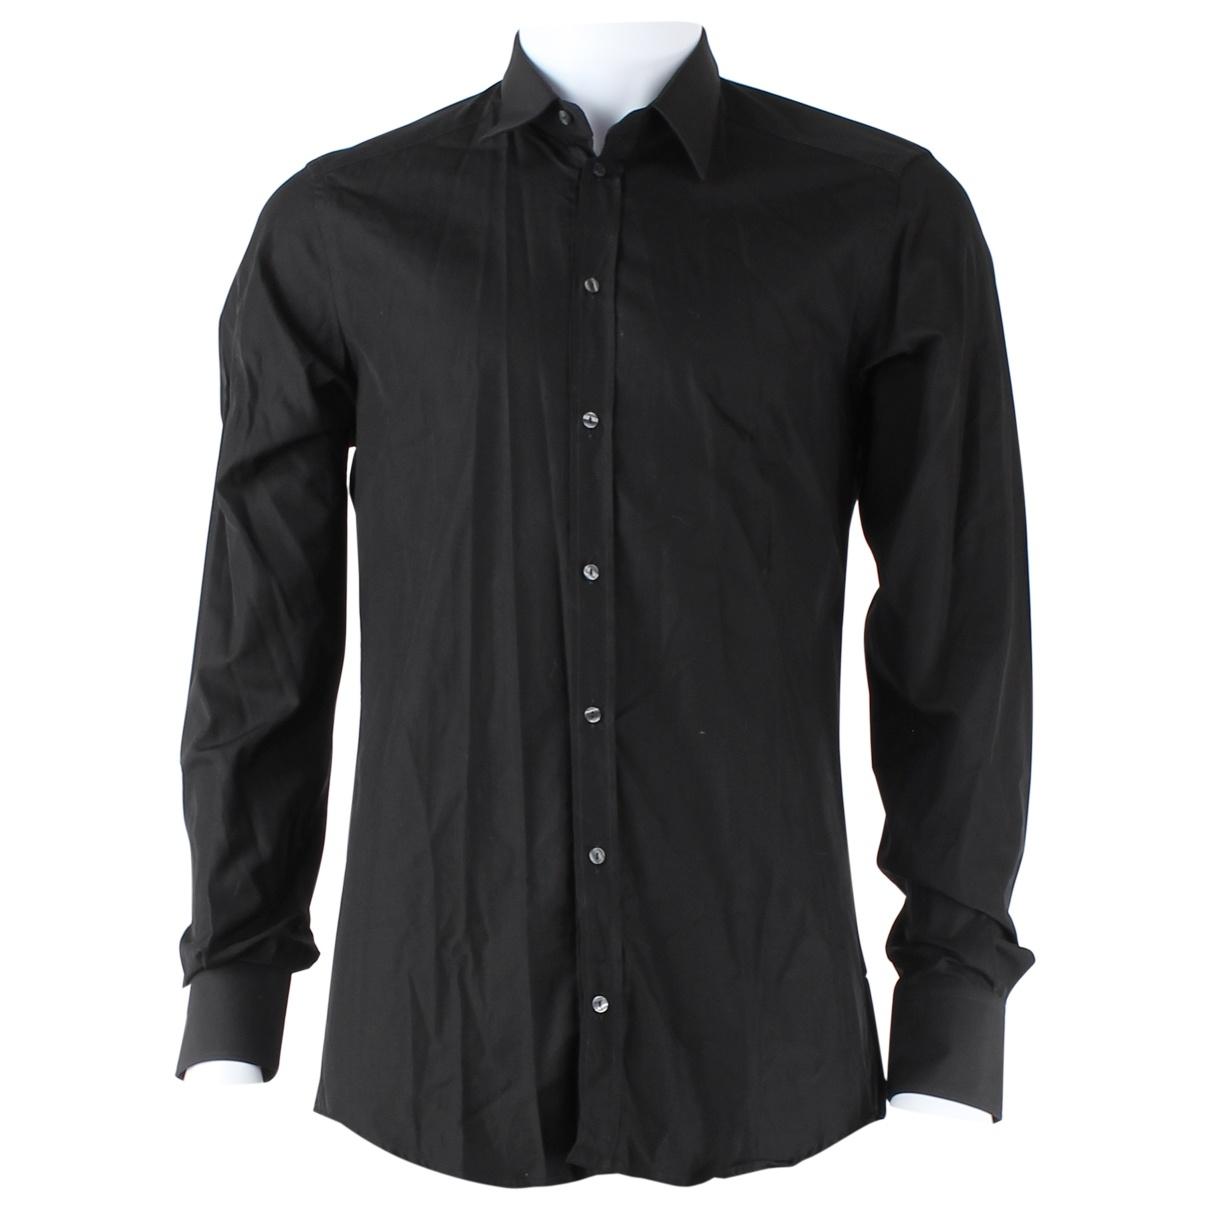 Dolce & Gabbana \N Black Cotton Shirts for Men S International